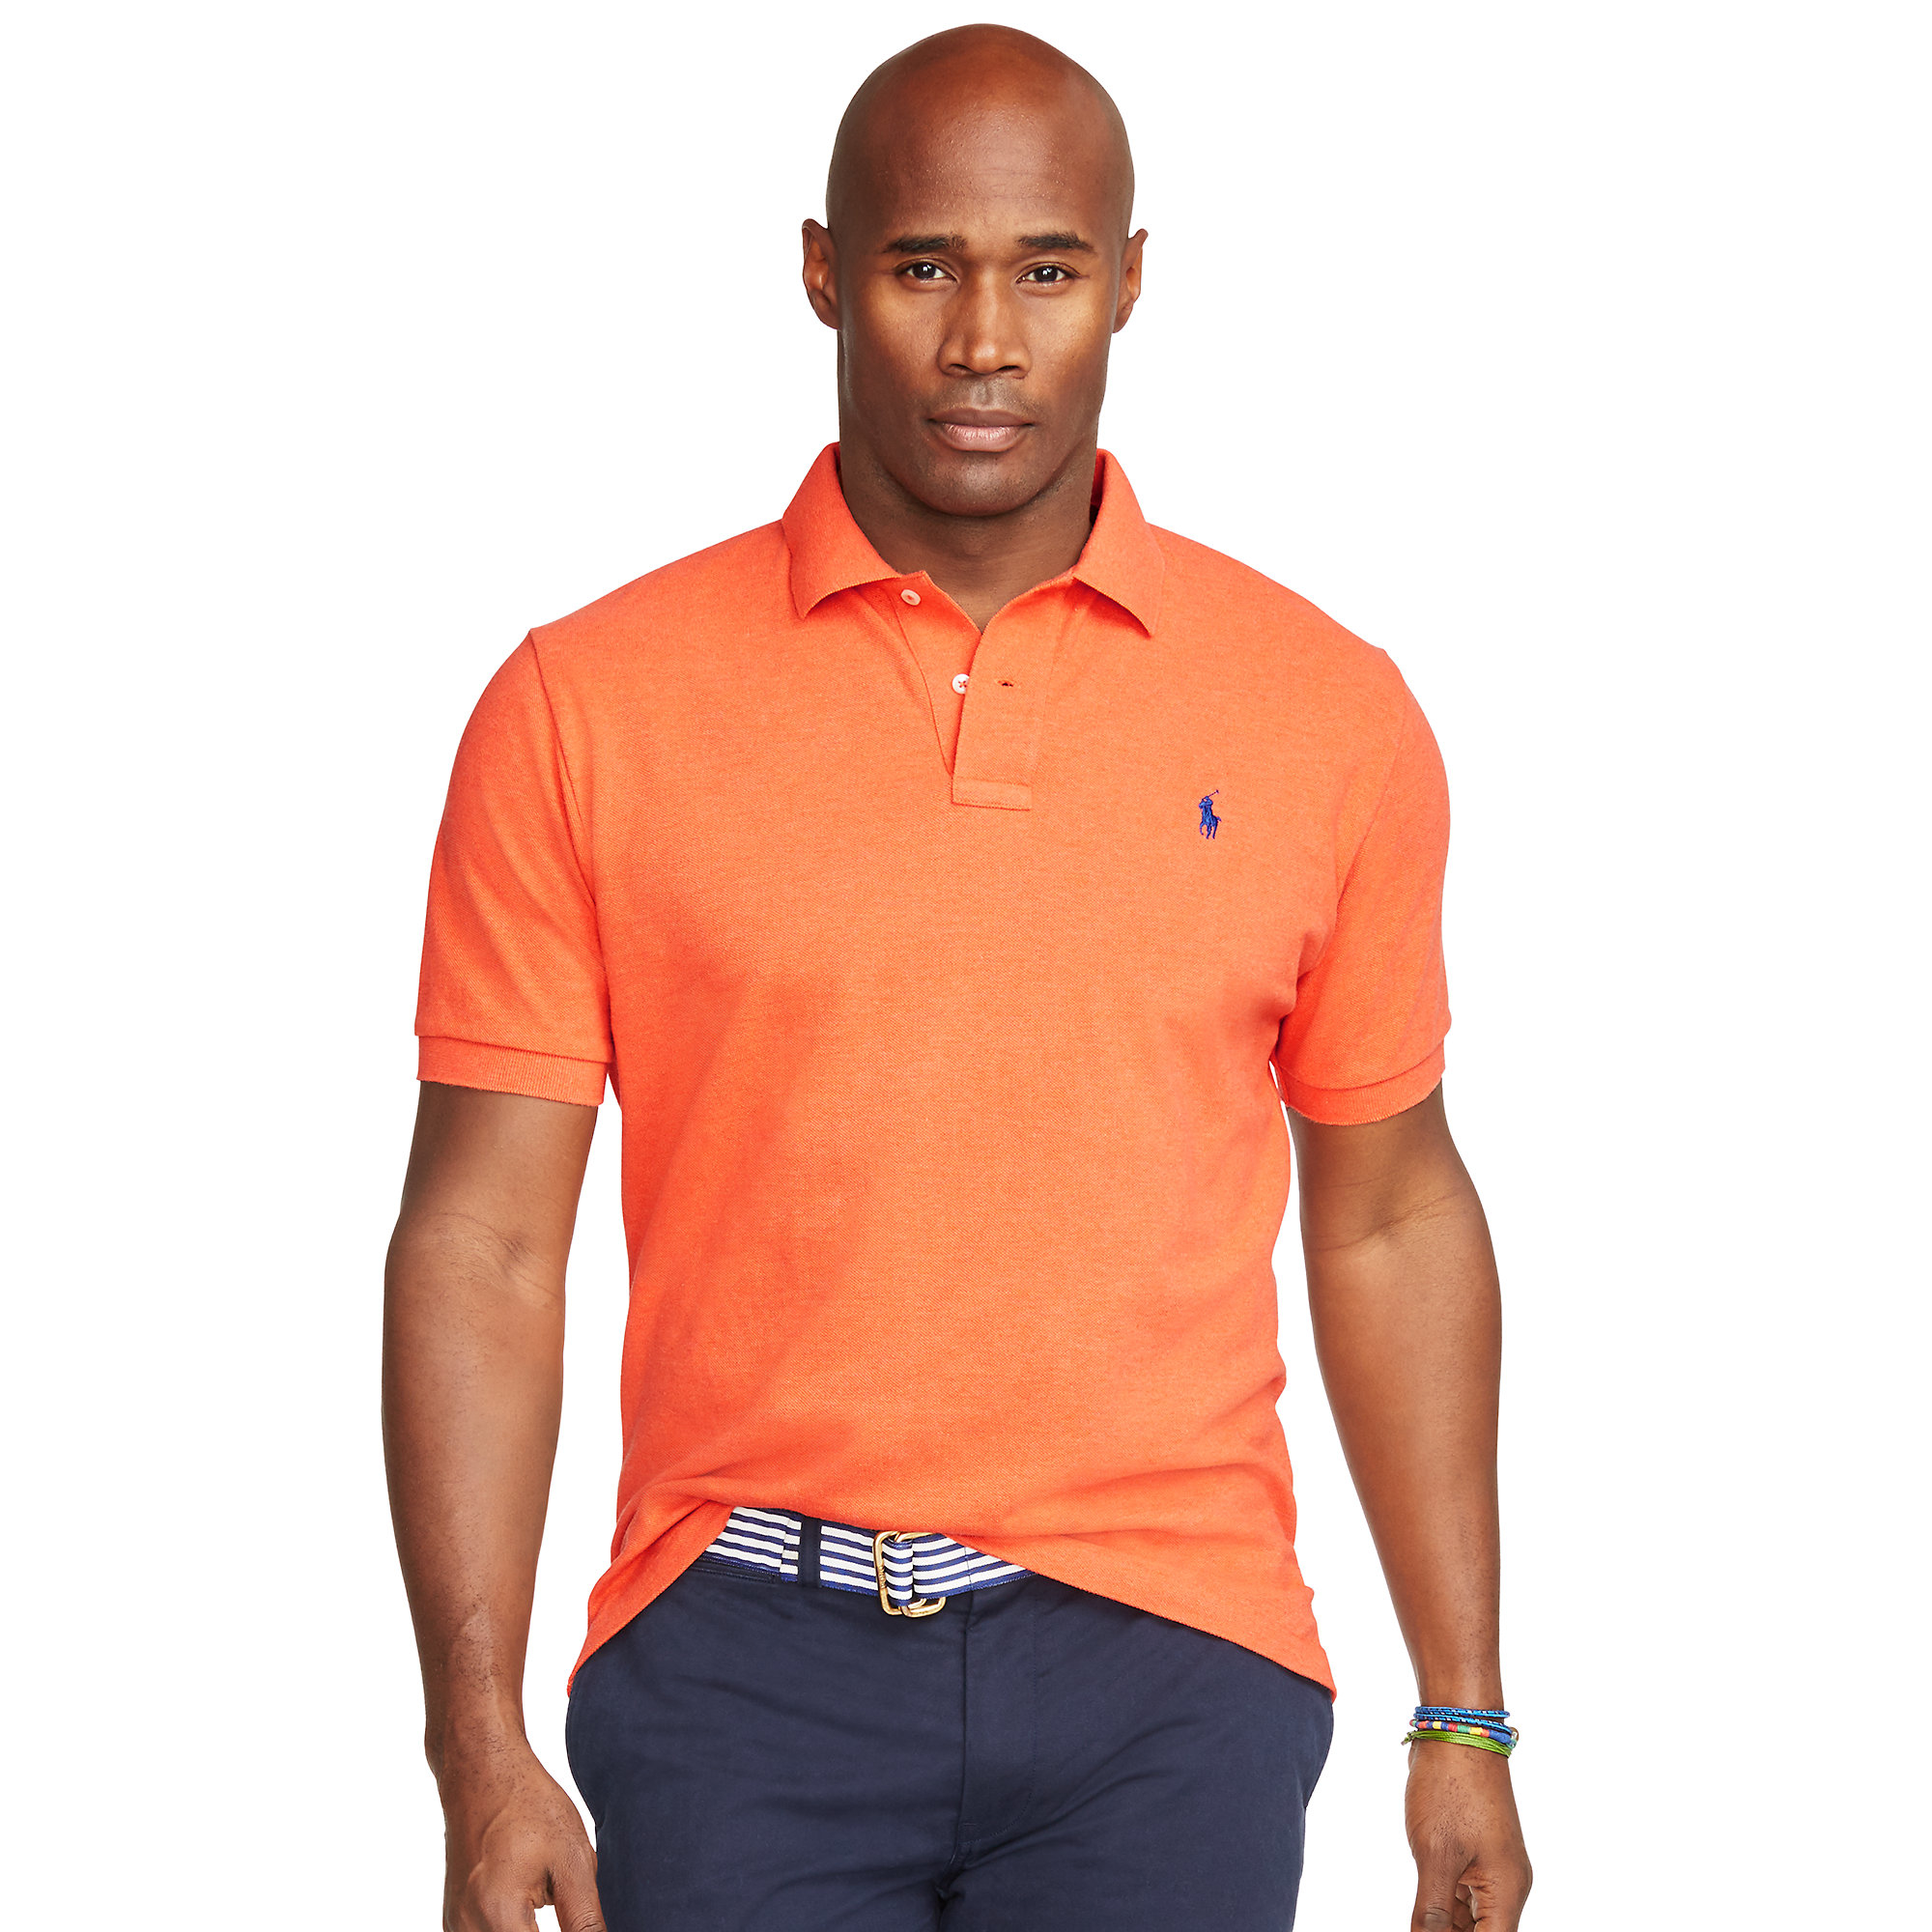 ... Classic-fit Mesh Polo Shirt for Men | Lyst. View Fullscreen